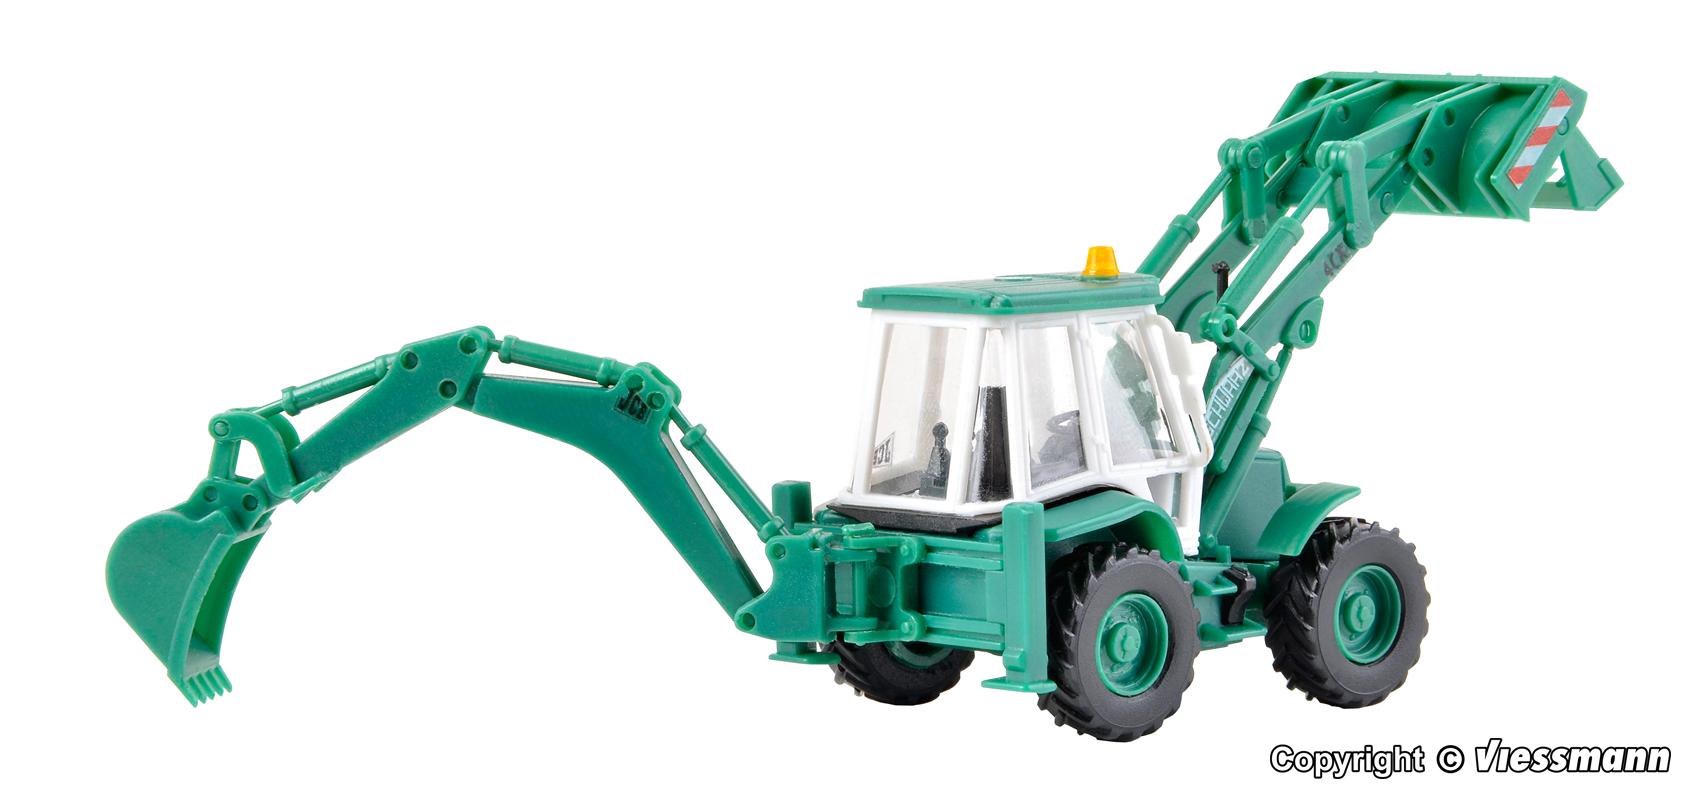 NEU /& OVP Bausatz Kibri 15217 H0  Baggerlader JCB 4CX 4x4x4 SchwarzBau